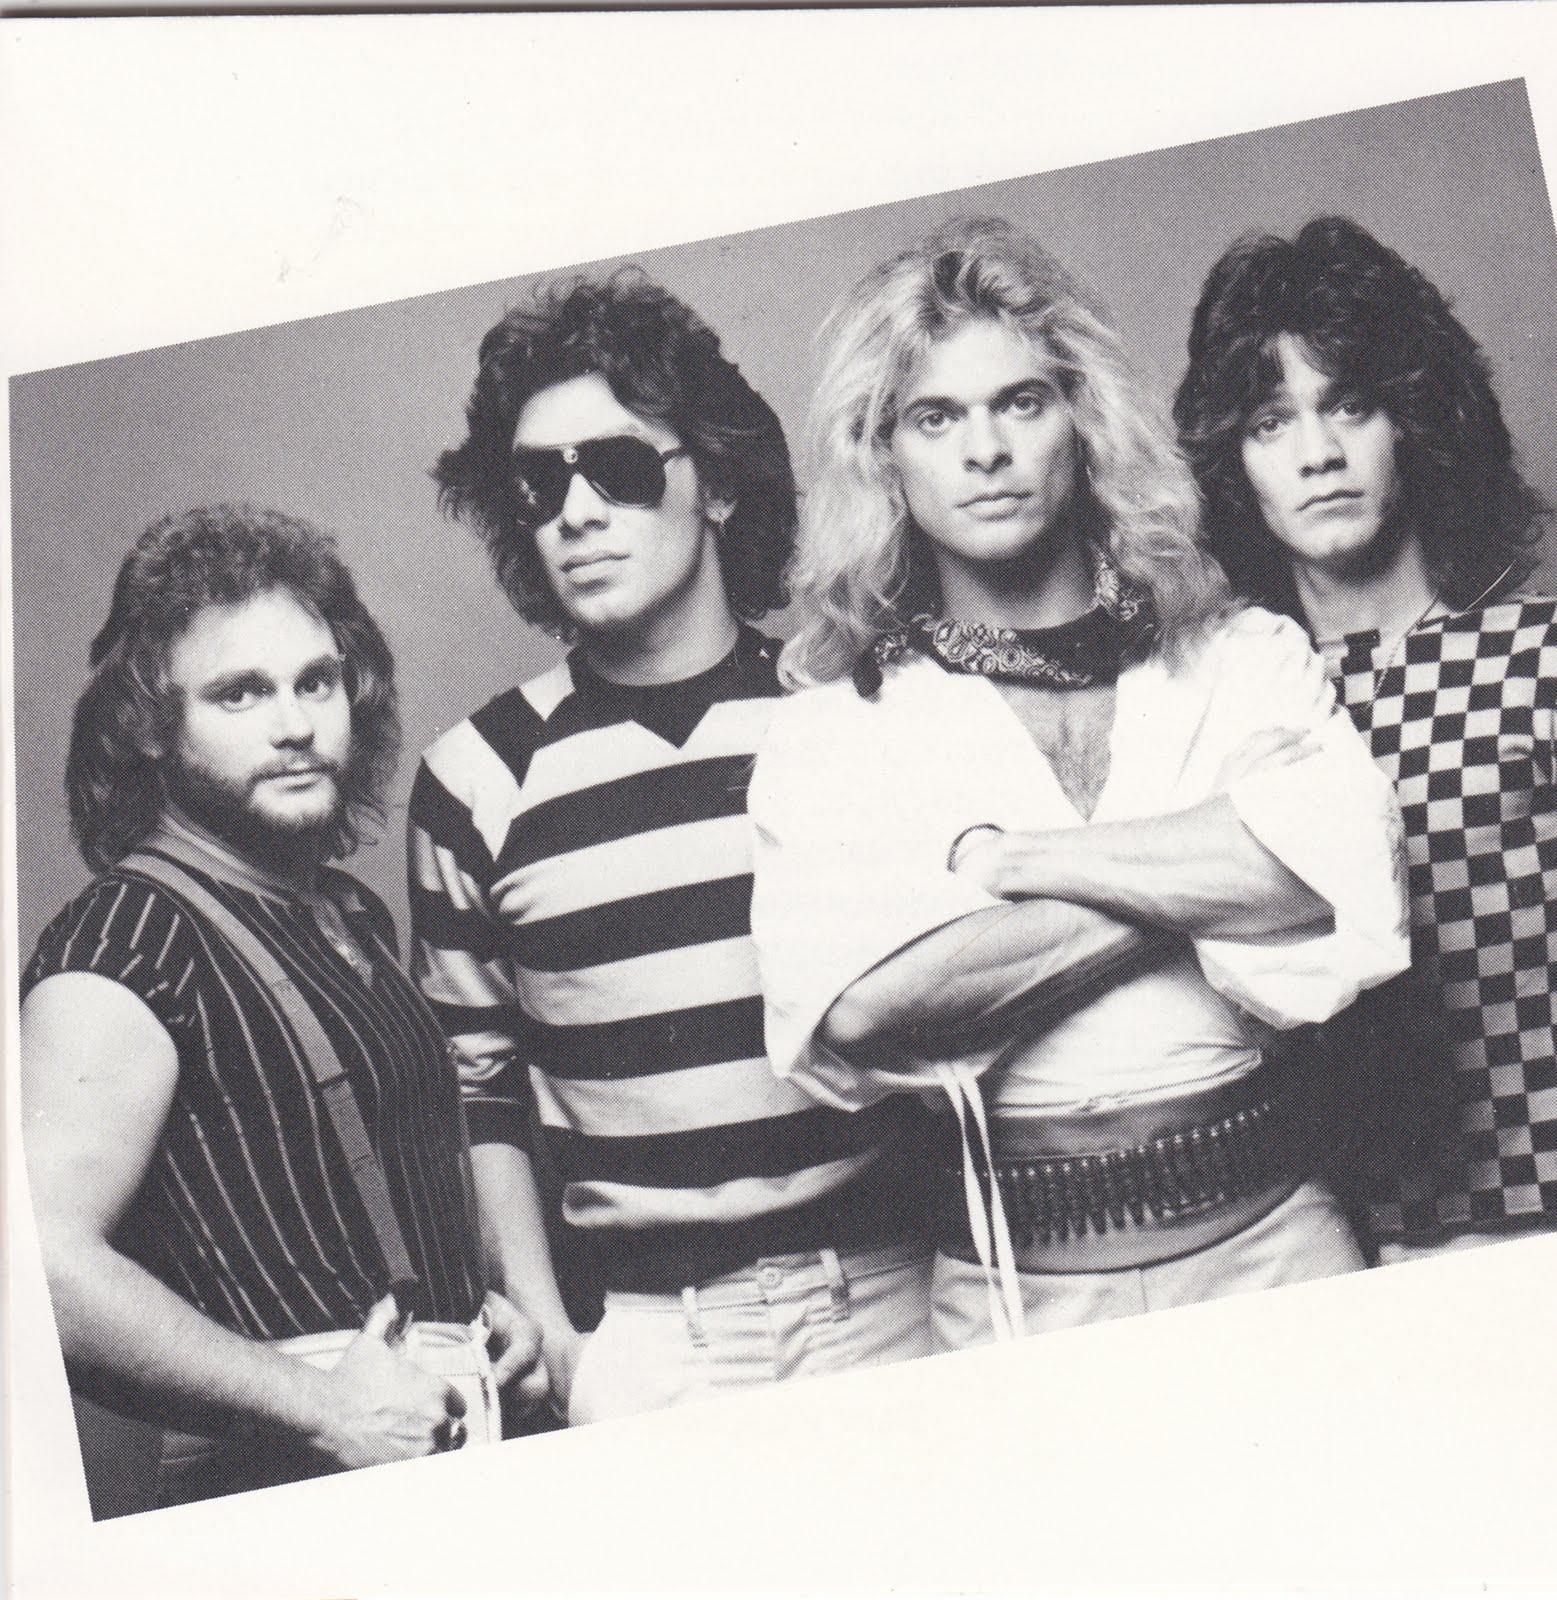 8aa004243f7 Eddie Van Halen  The David Lee Roth EraJas Obrecht Music Archive ...